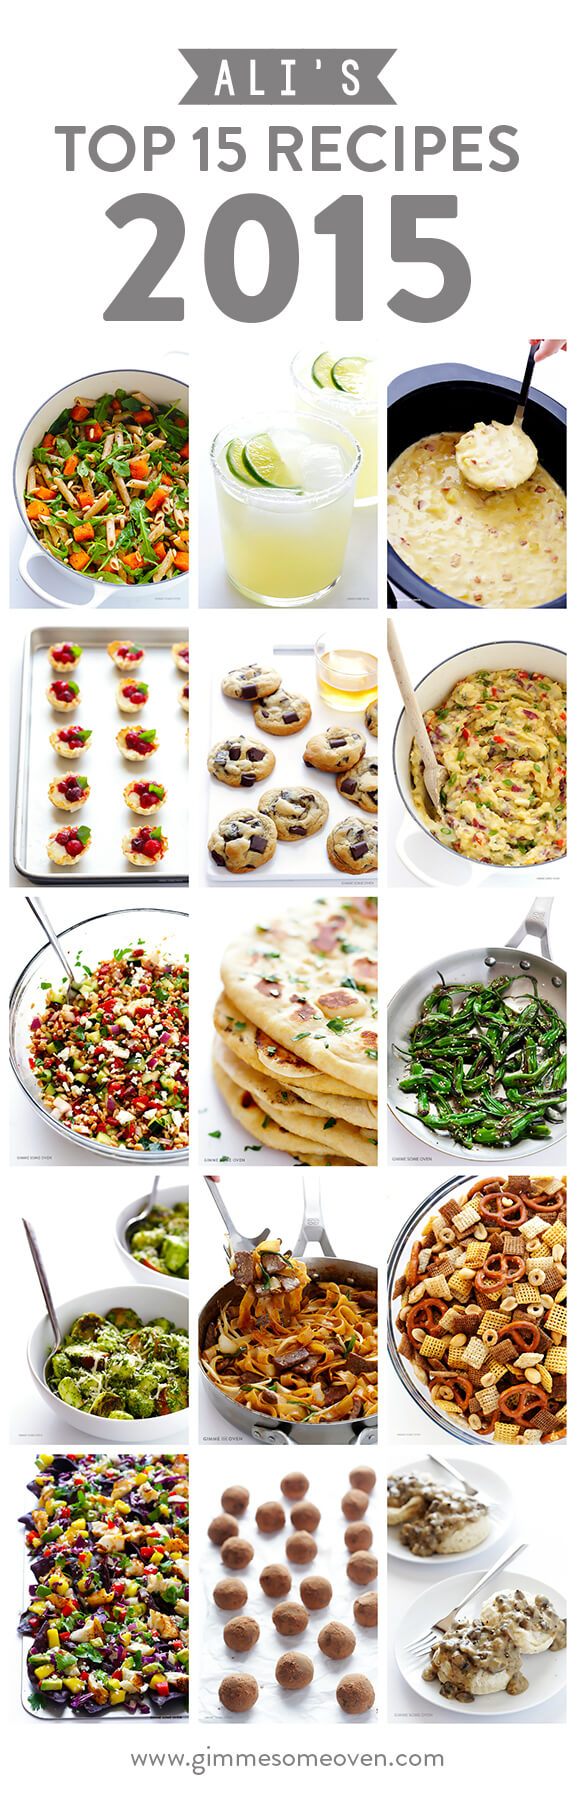 Ali's Top 15 Recipes of 2015 | gimmesomeoven.com